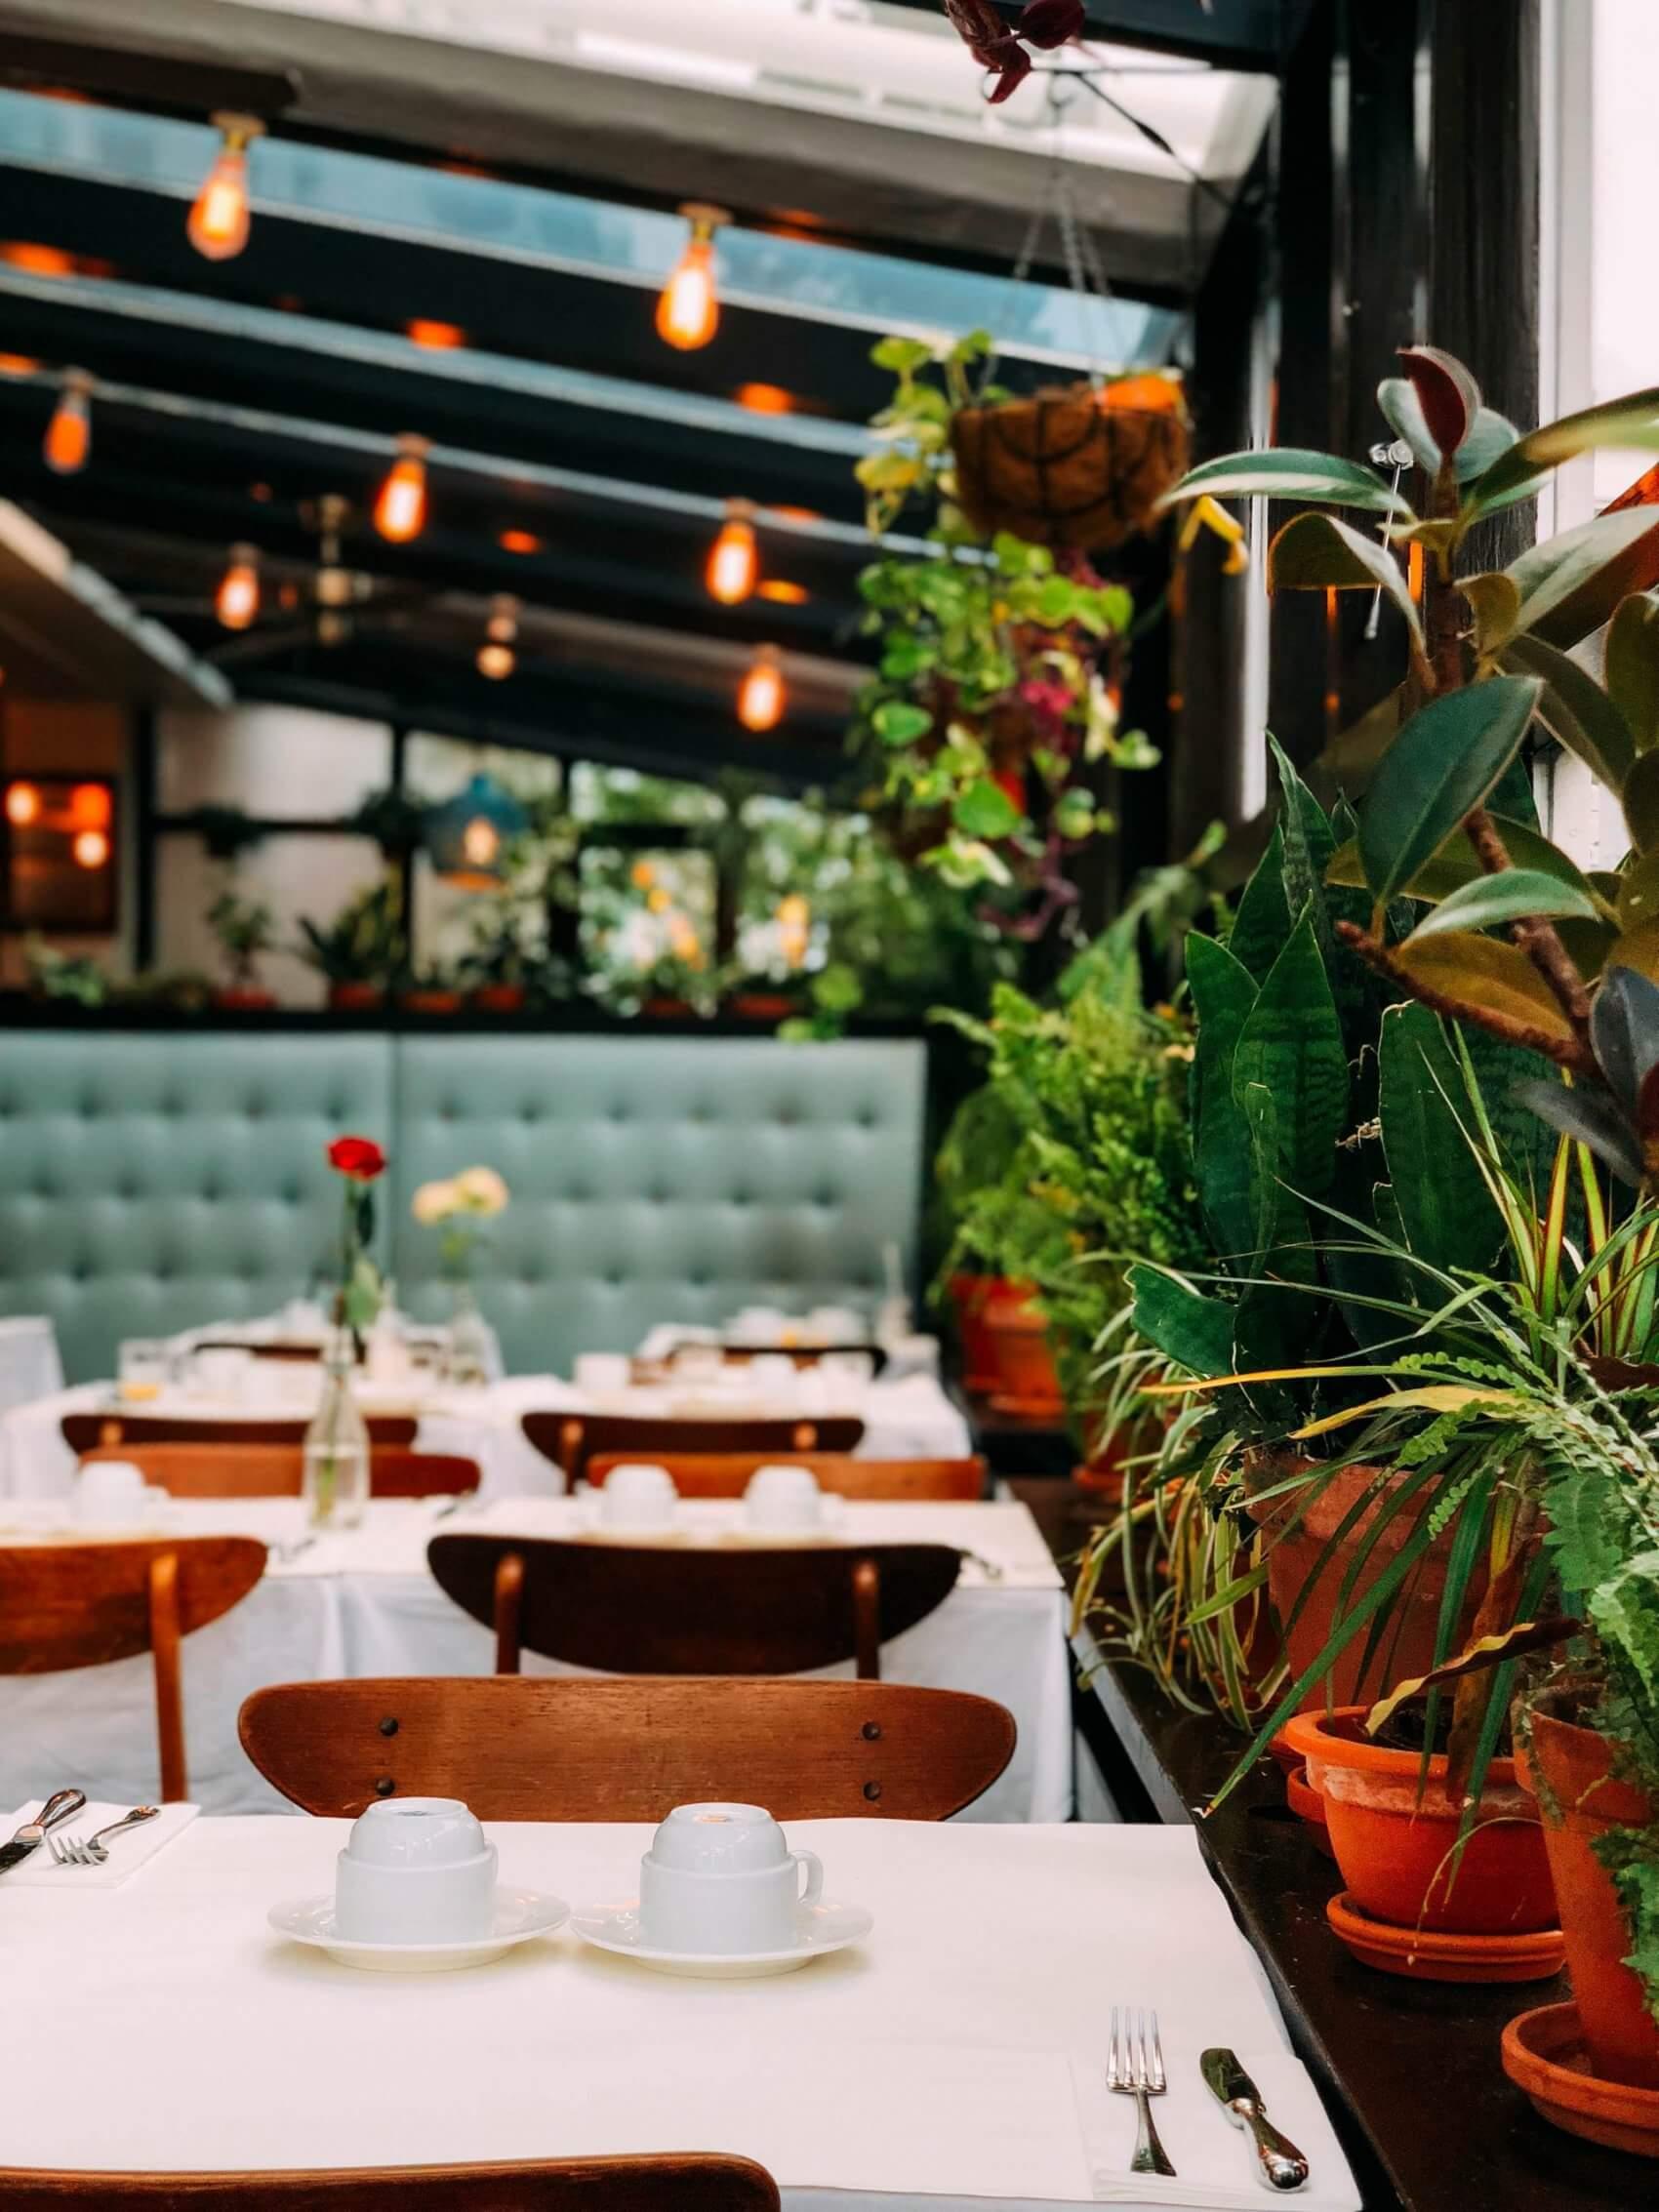 Modern Restaurant with Plants